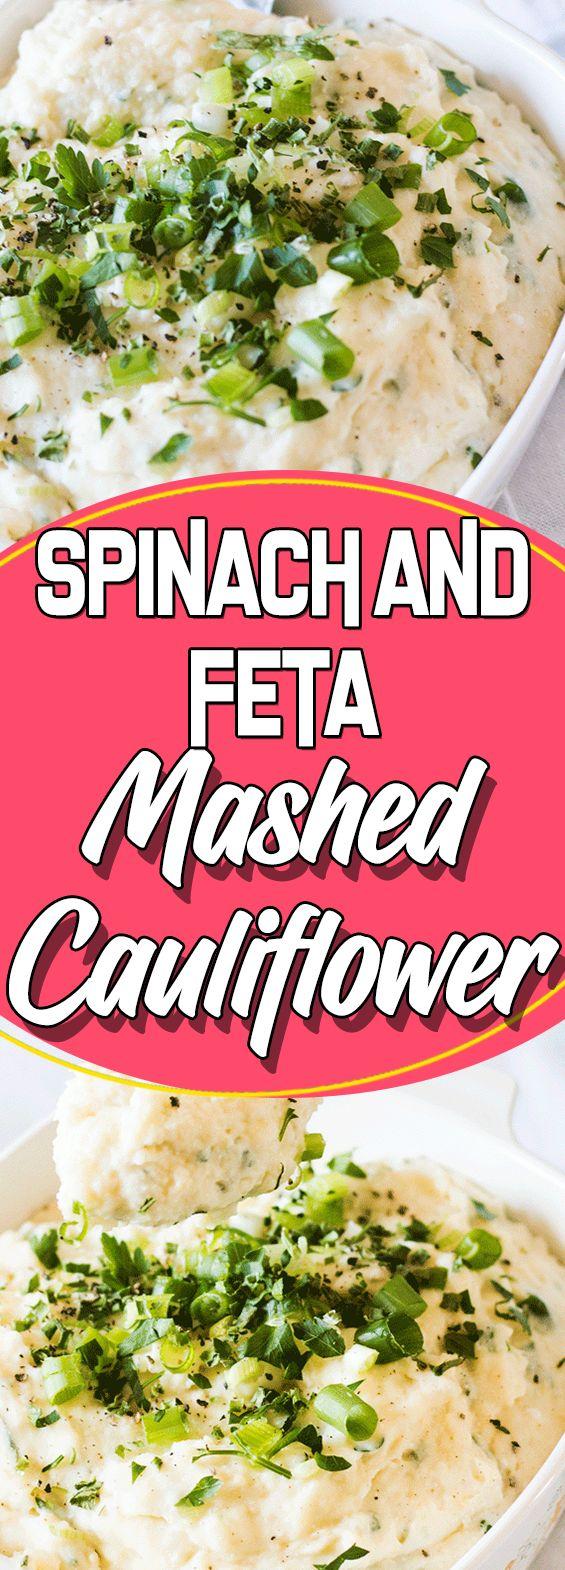 Spinach and Feta Mashed Cauliflower #healthyrecipes #copycatrecipe #easyrecipes #comfortfood #paleo #glutenfree